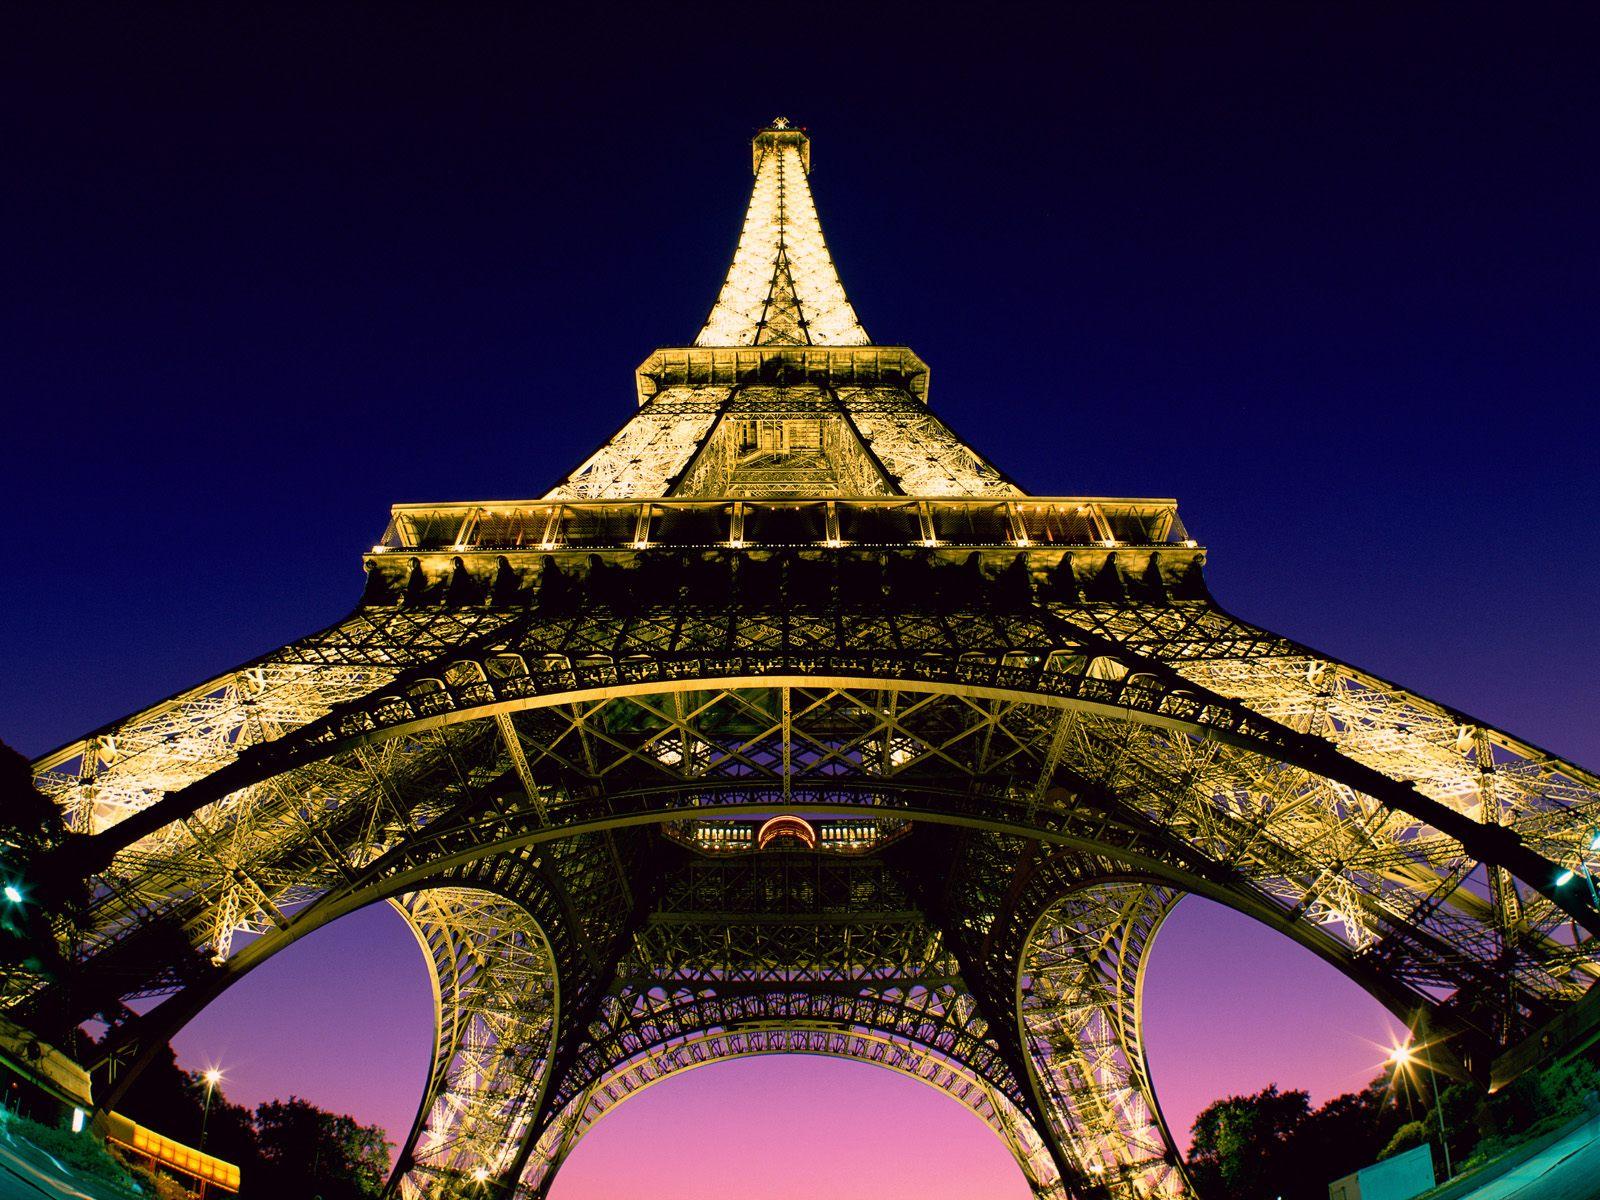 http://4.bp.blogspot.com/-5y2V9oi6lk8/UC42ahPU7qI/AAAAAAAAZuI/0TiR05rFaLA/s1600/Paris+-++Turnul+Eiffel+-+Franta.jpg